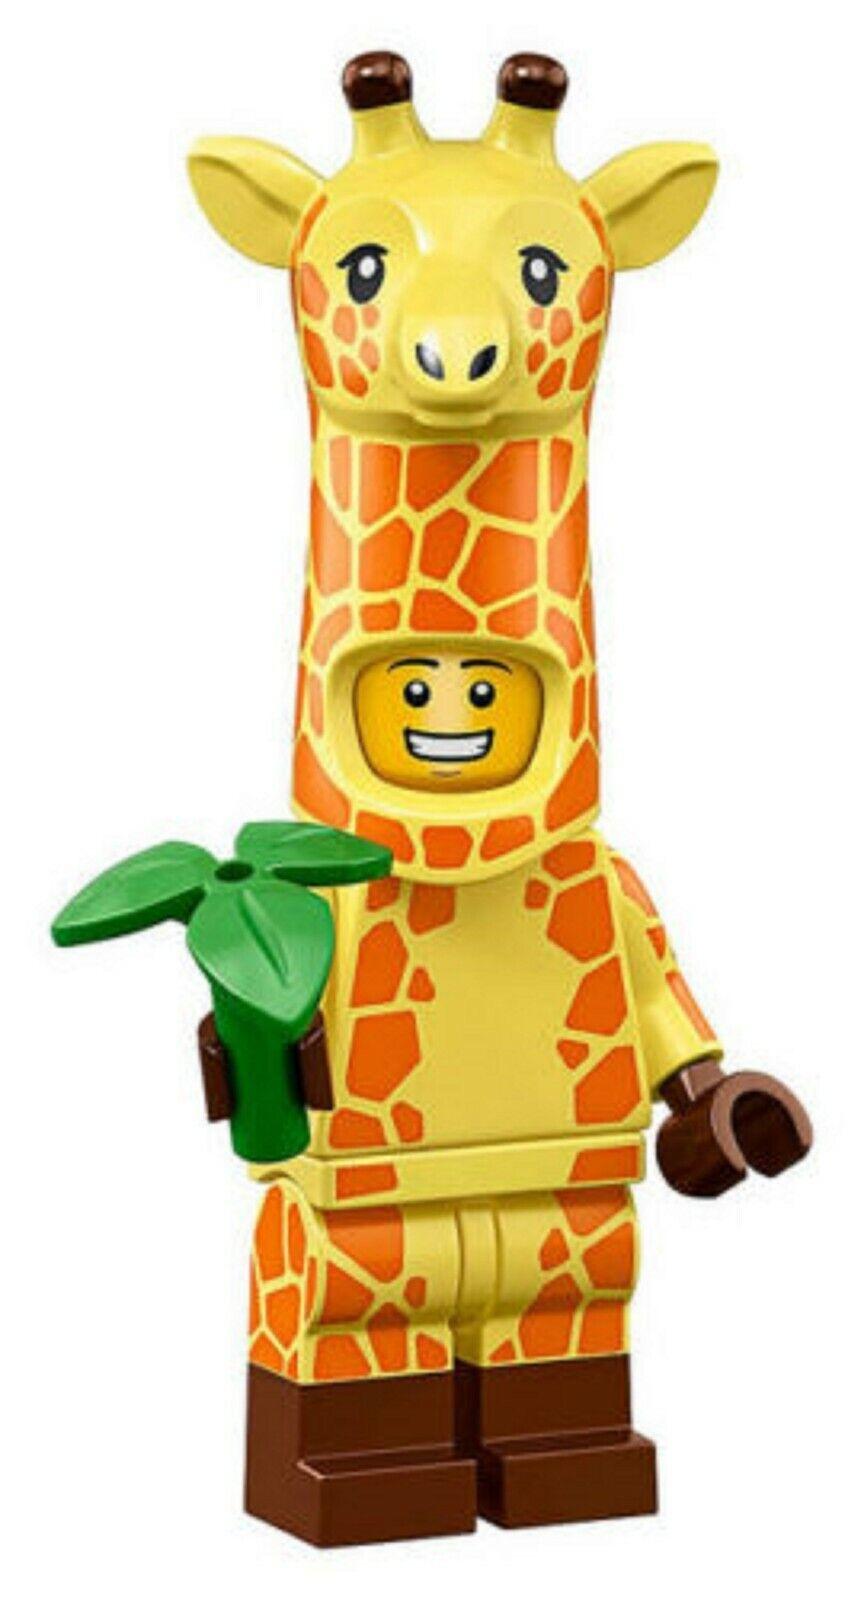 Lego 71023 The Lego Movie 2, Magicien d'Oz Series (girafe Guy)